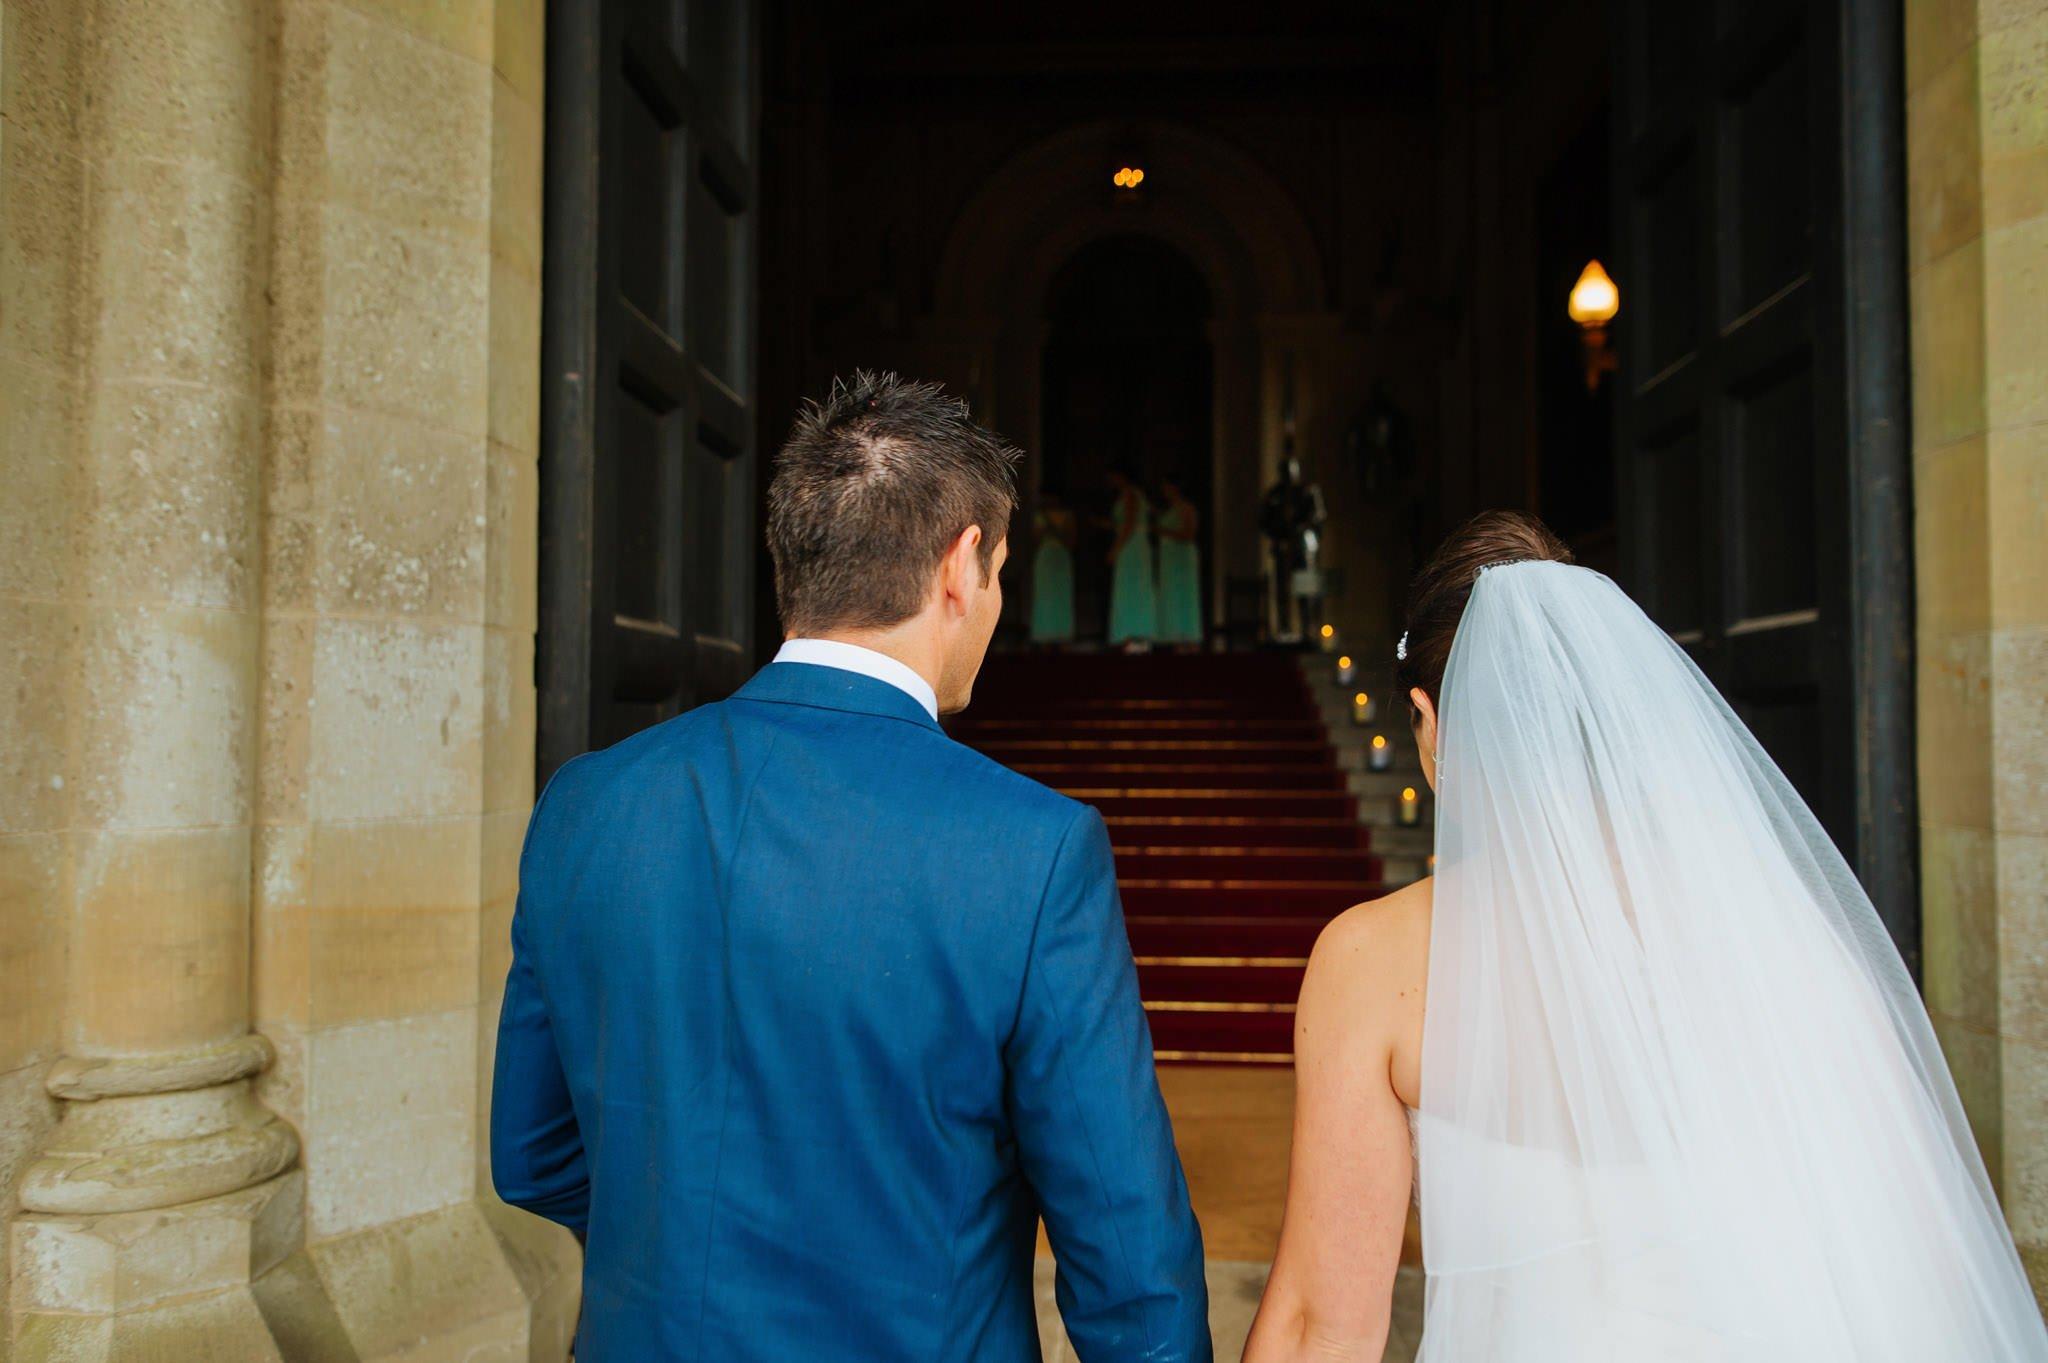 Eastnor Castle wedding photographer Herefordshire, West Midlands - Sarah + Dean 48